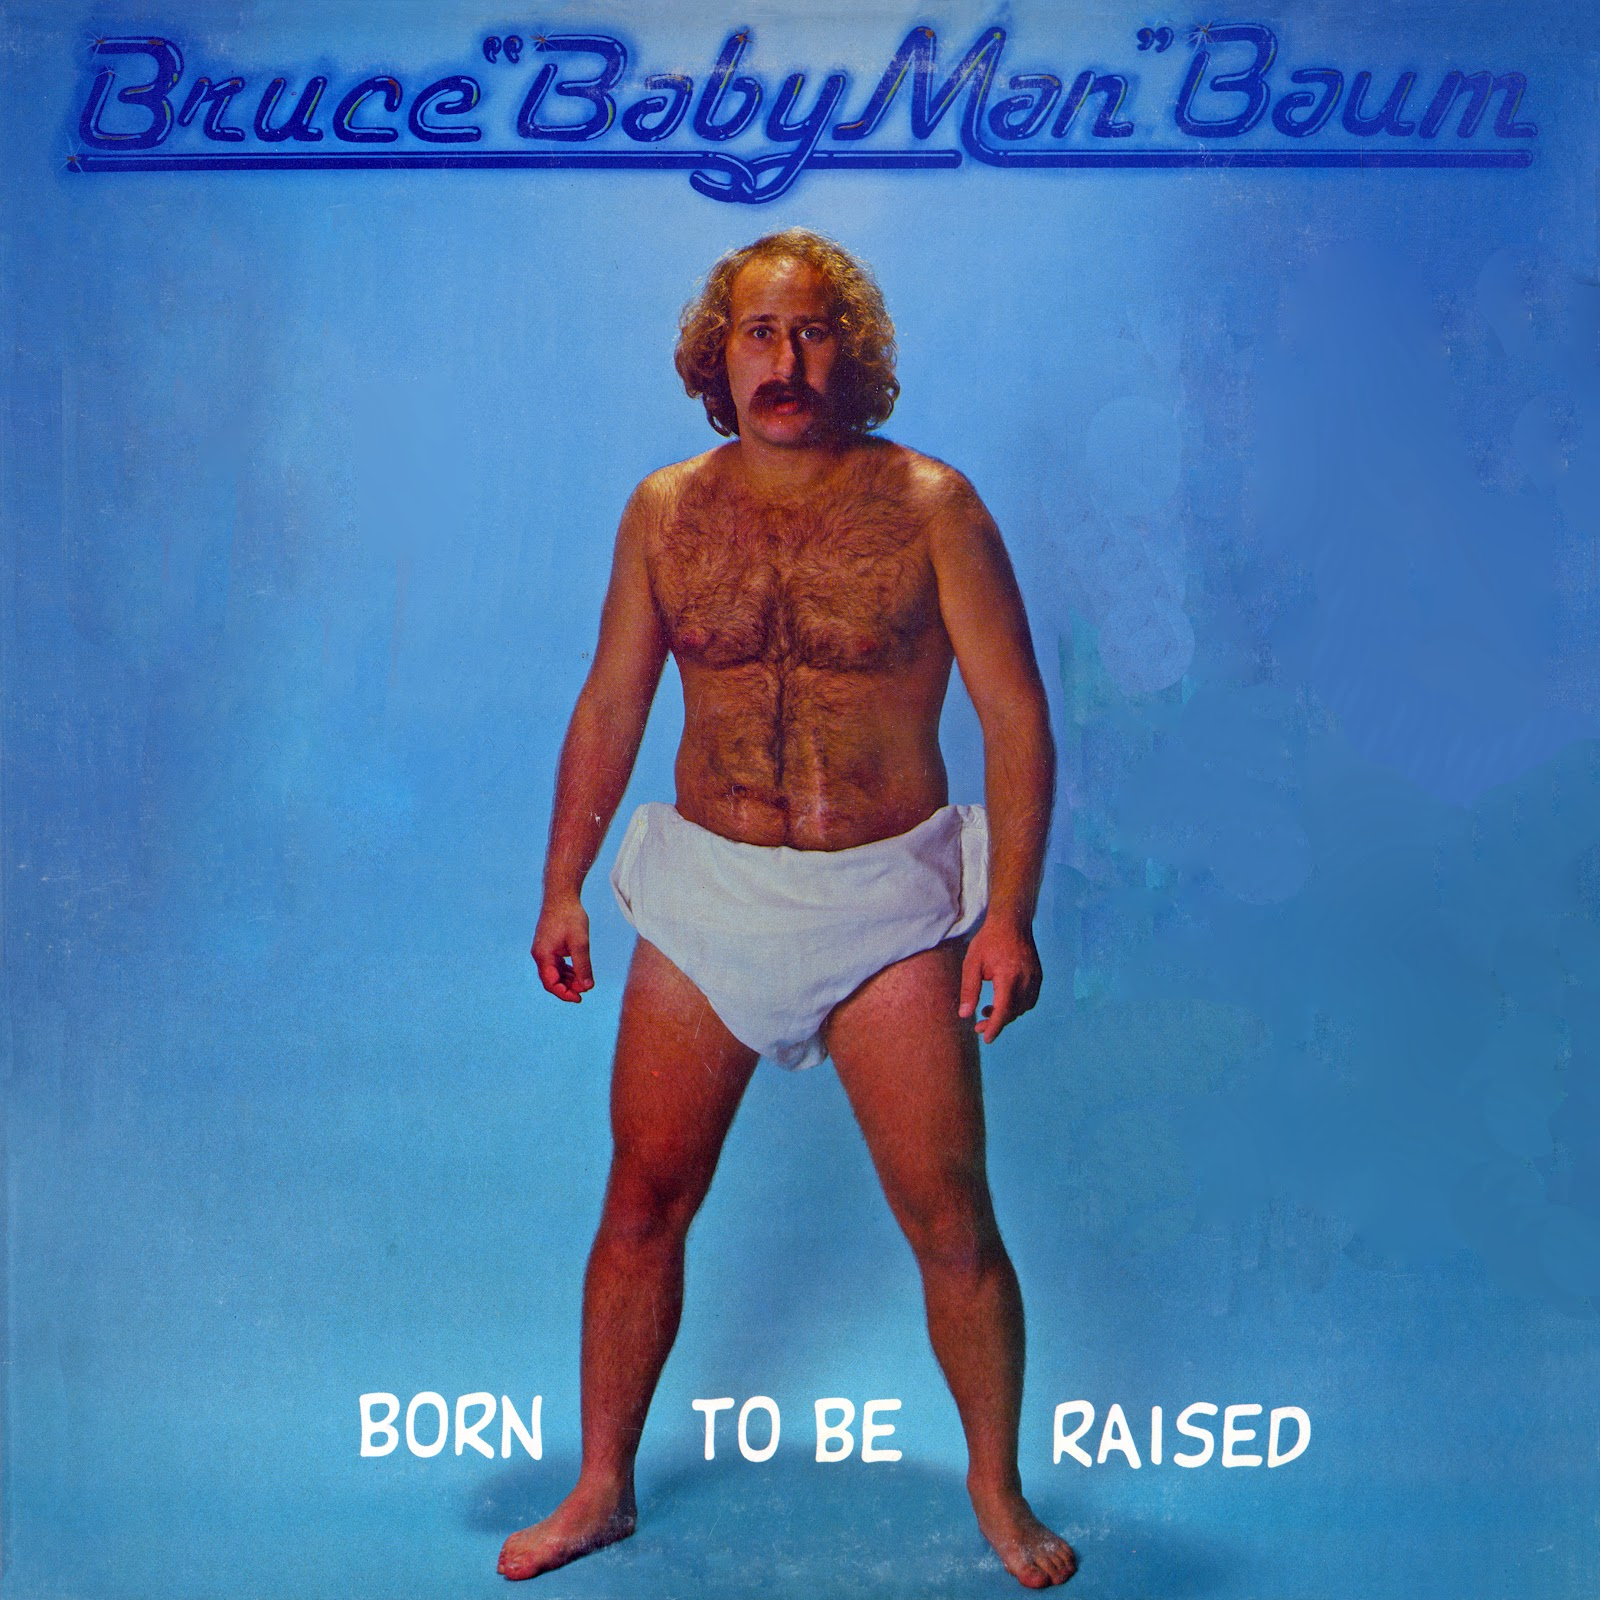 Bruce Baum Net Worth